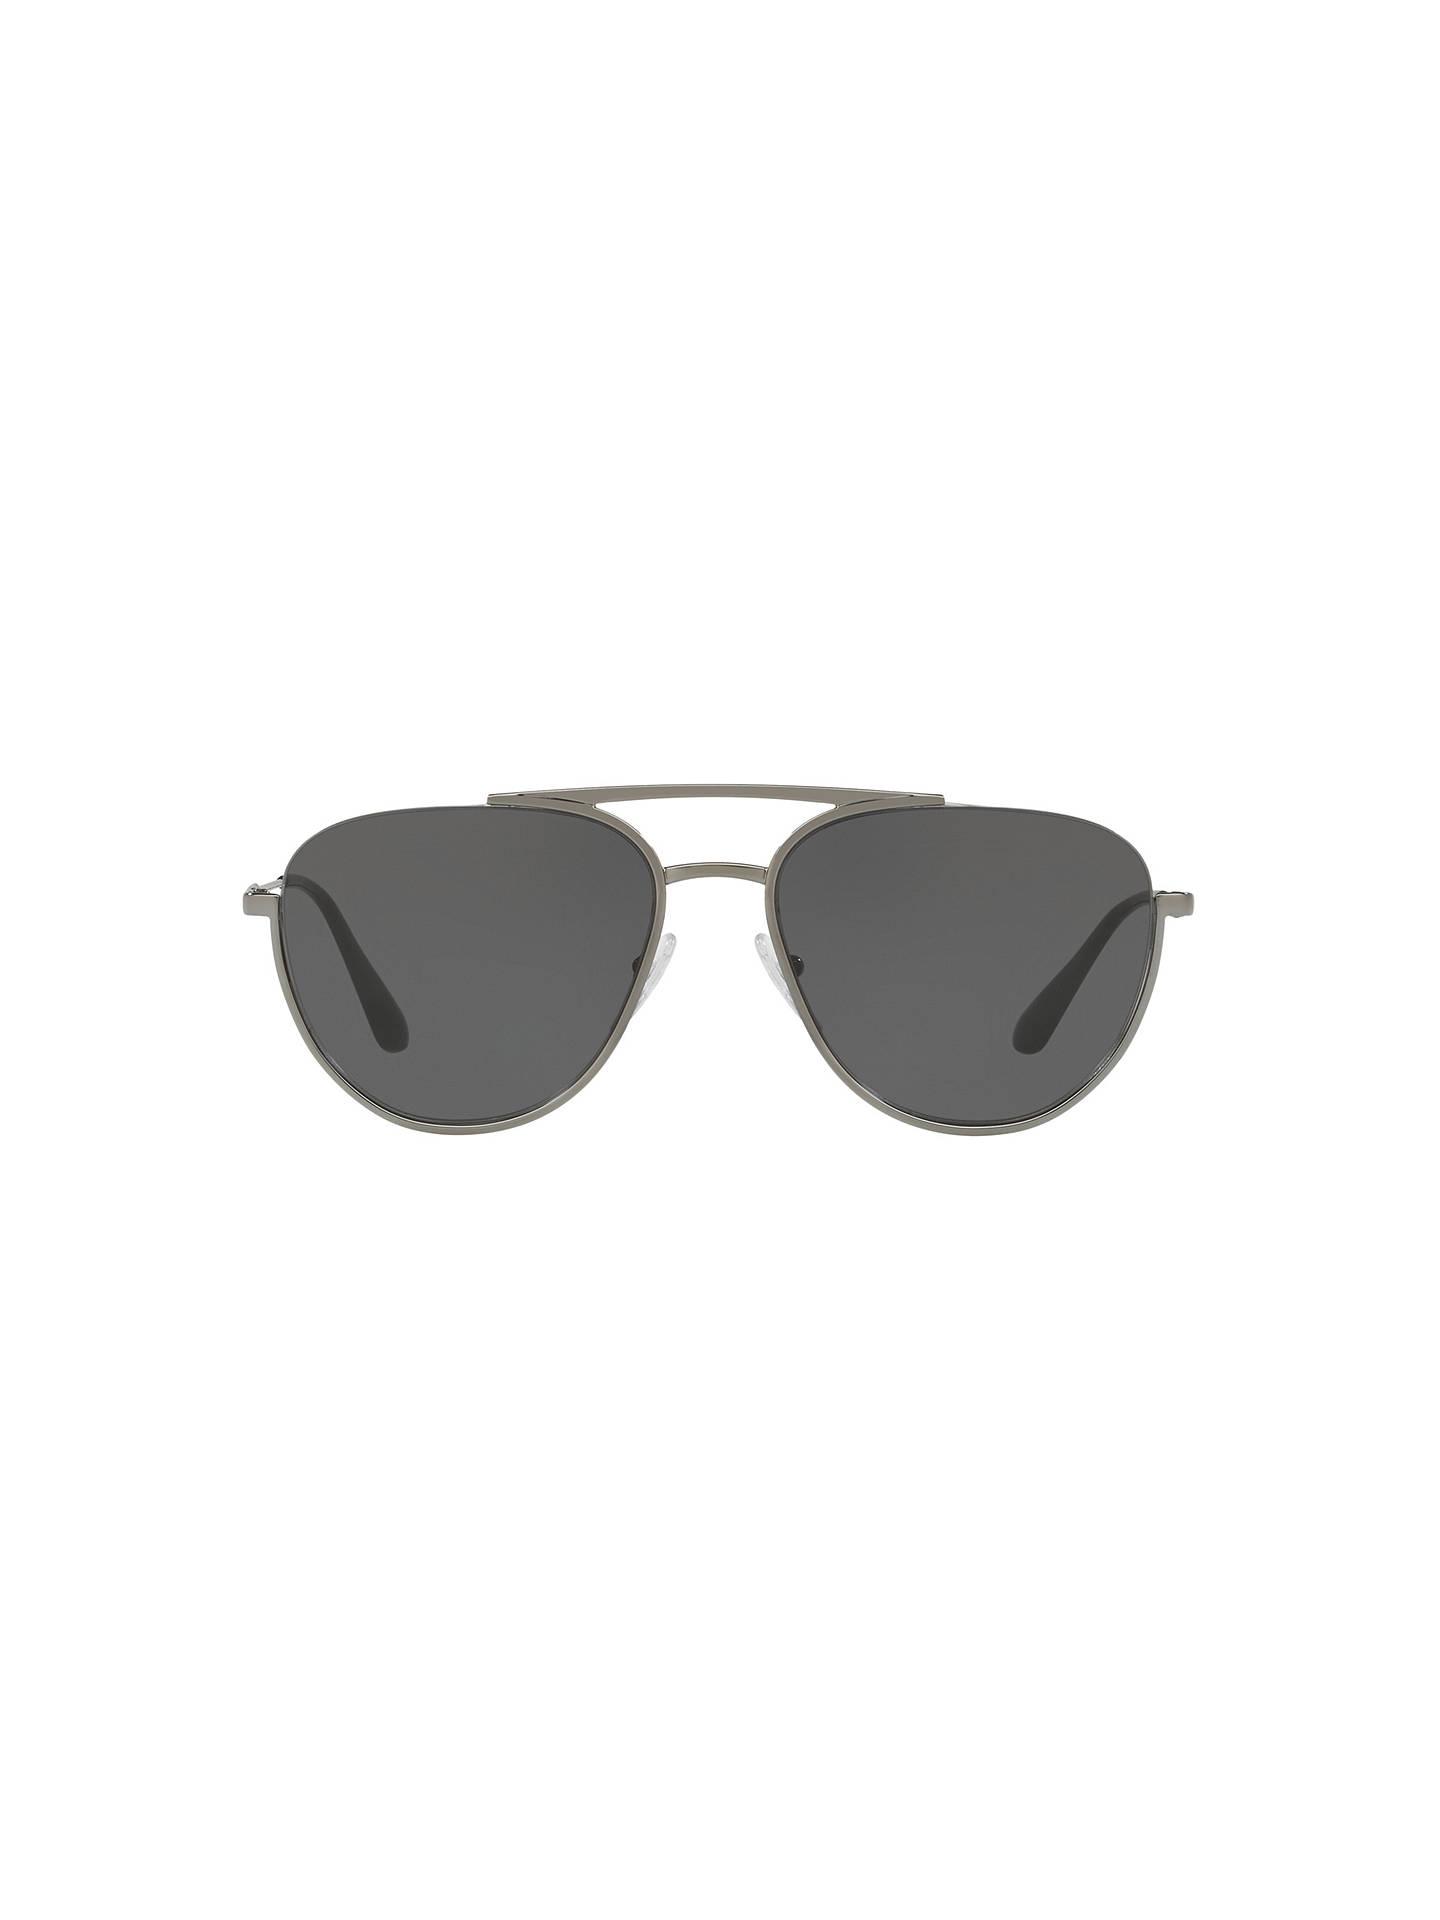 04c328d9f223 Prada PR 50US Men s Oval Sunglasses at John Lewis   Partners